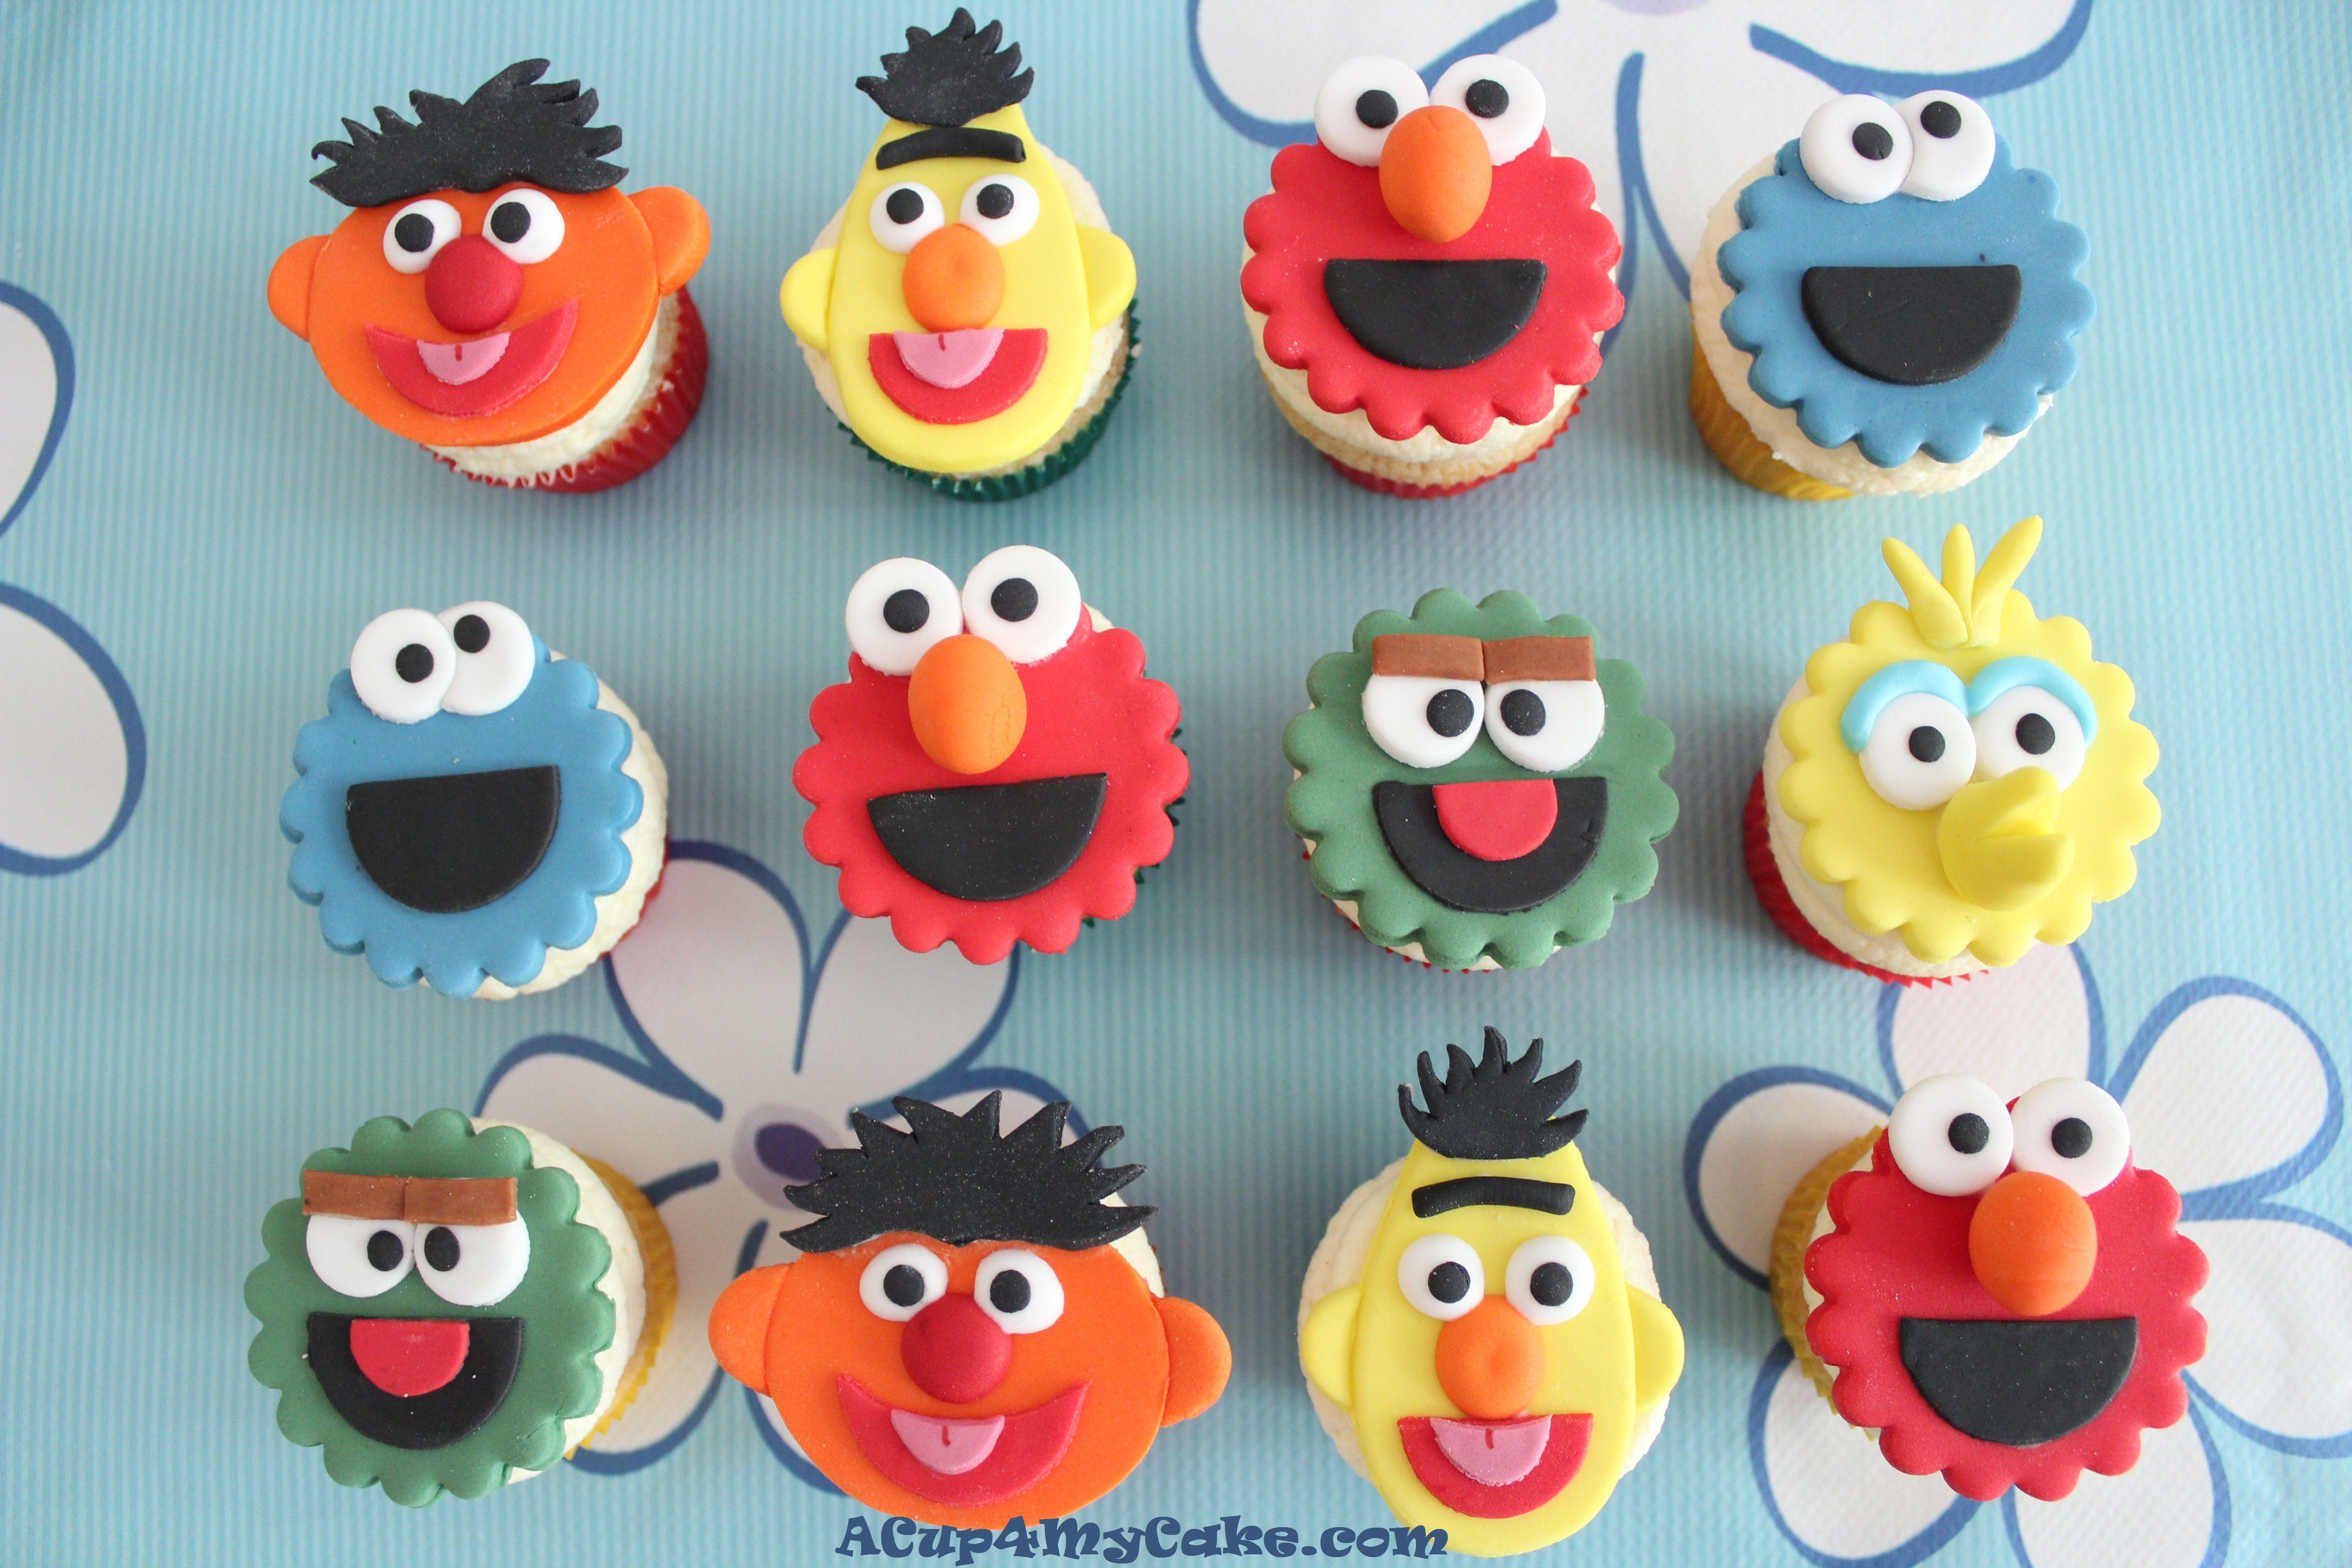 Sesame Street Cupcakes  Cookie Monster Cake & Sesame Street Cupcakes